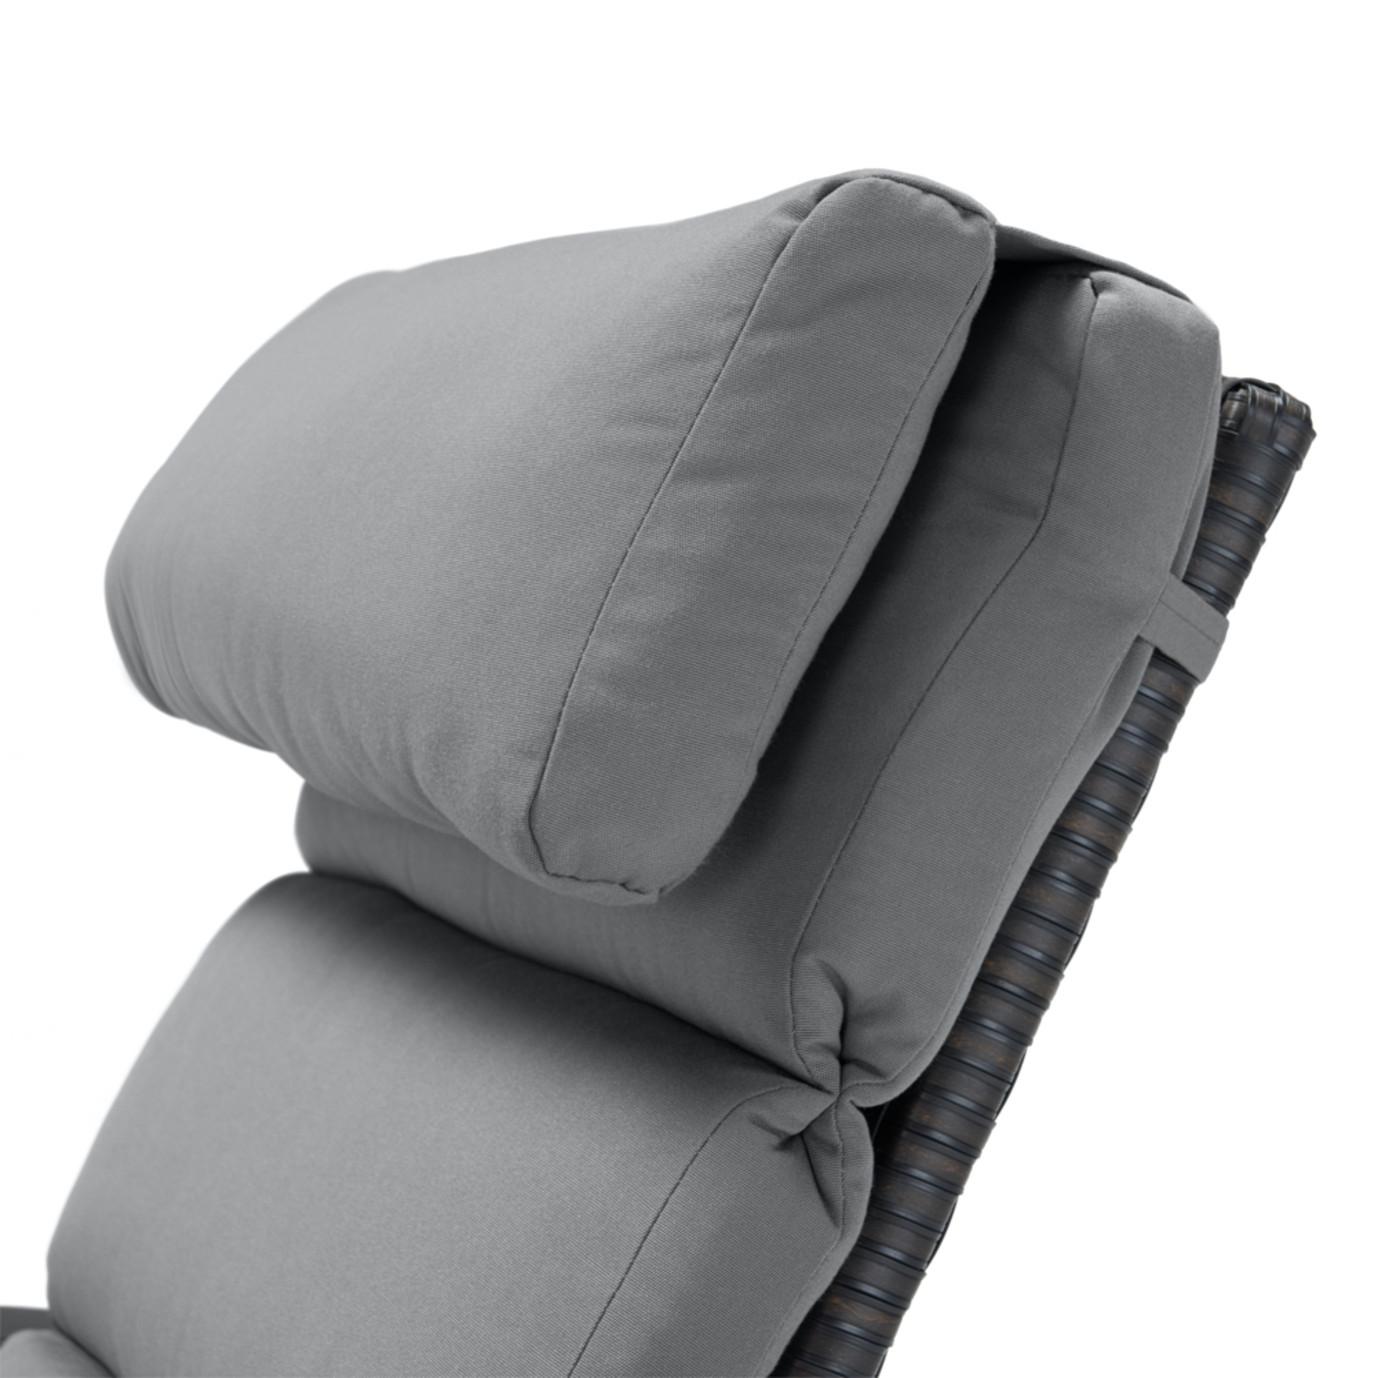 Barcelo™ Chaise Lounge 2pk - Charcoal Gray